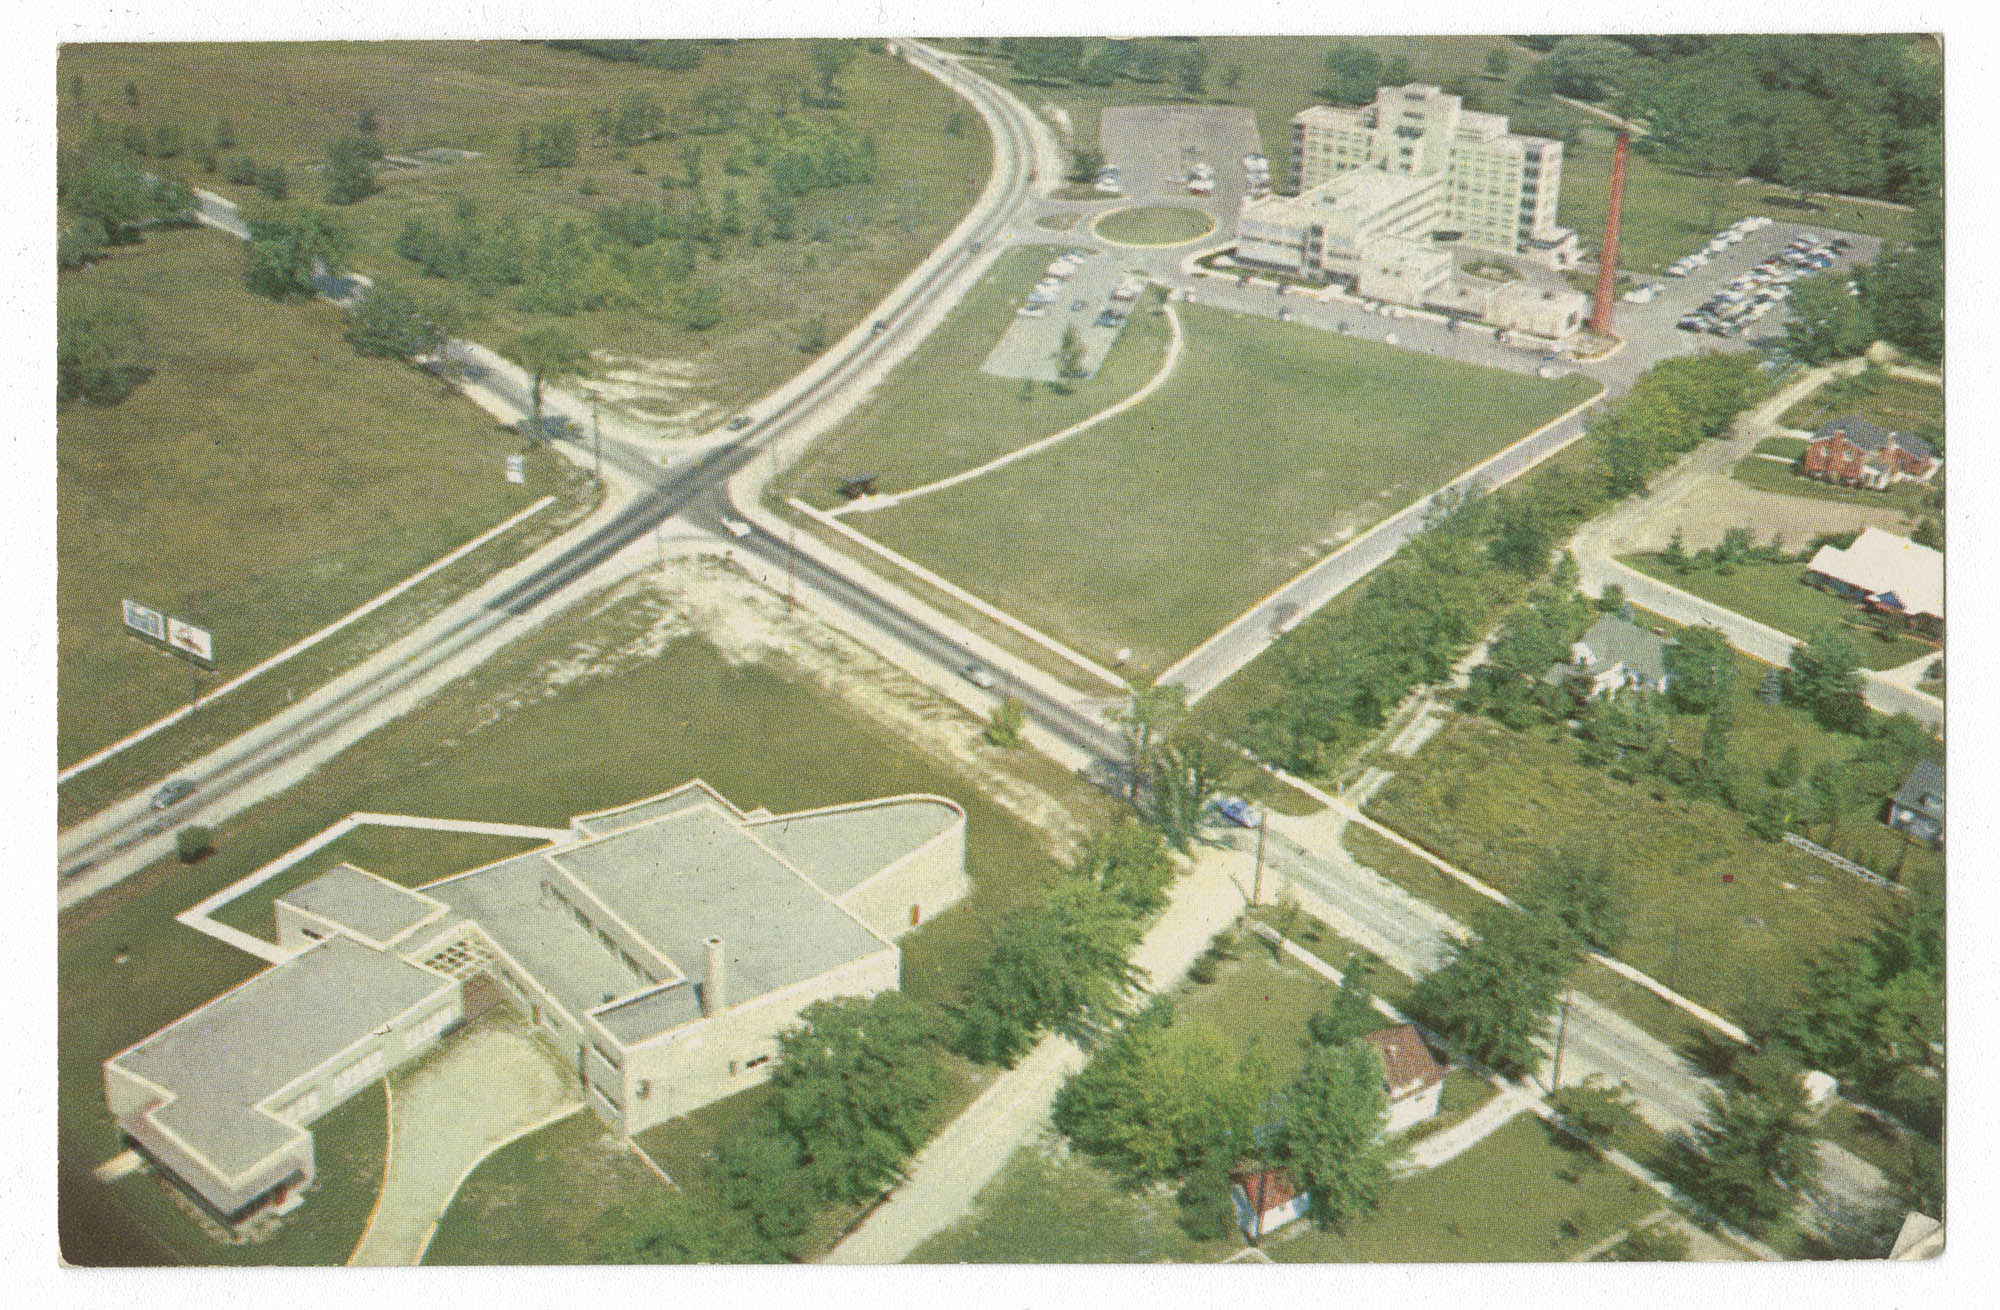 Aerial view of McLaren General Hospital and Temple Beth El, Flint, Michigan